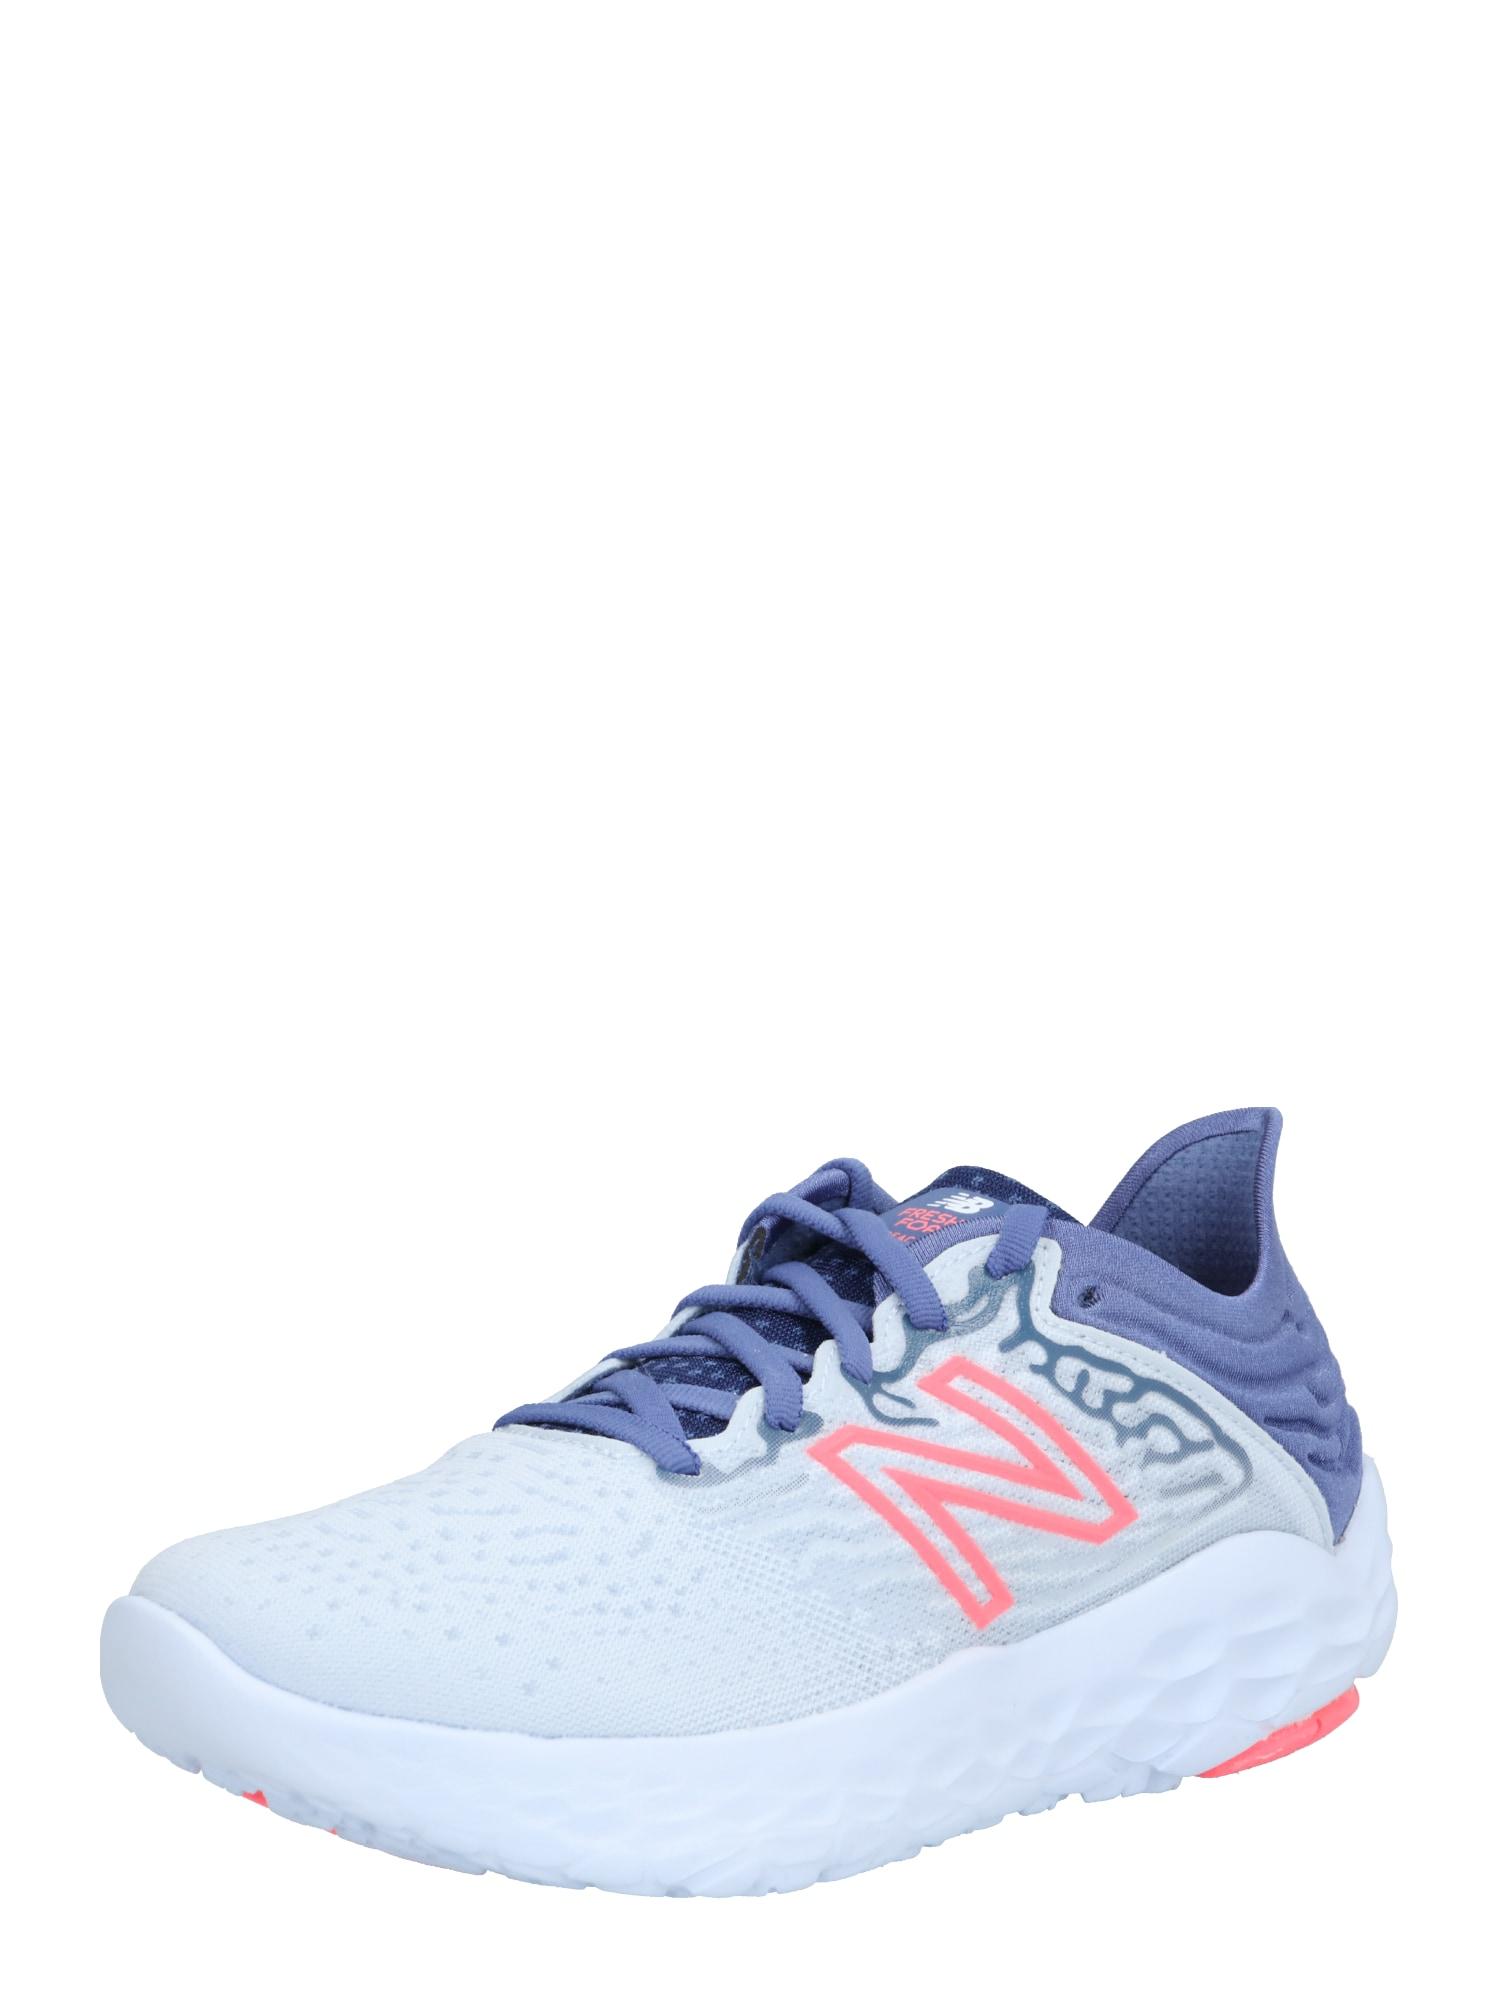 "new balance Bėgimo batai balta / sodri mėlyna (""karališka"") / lašišų spalva"